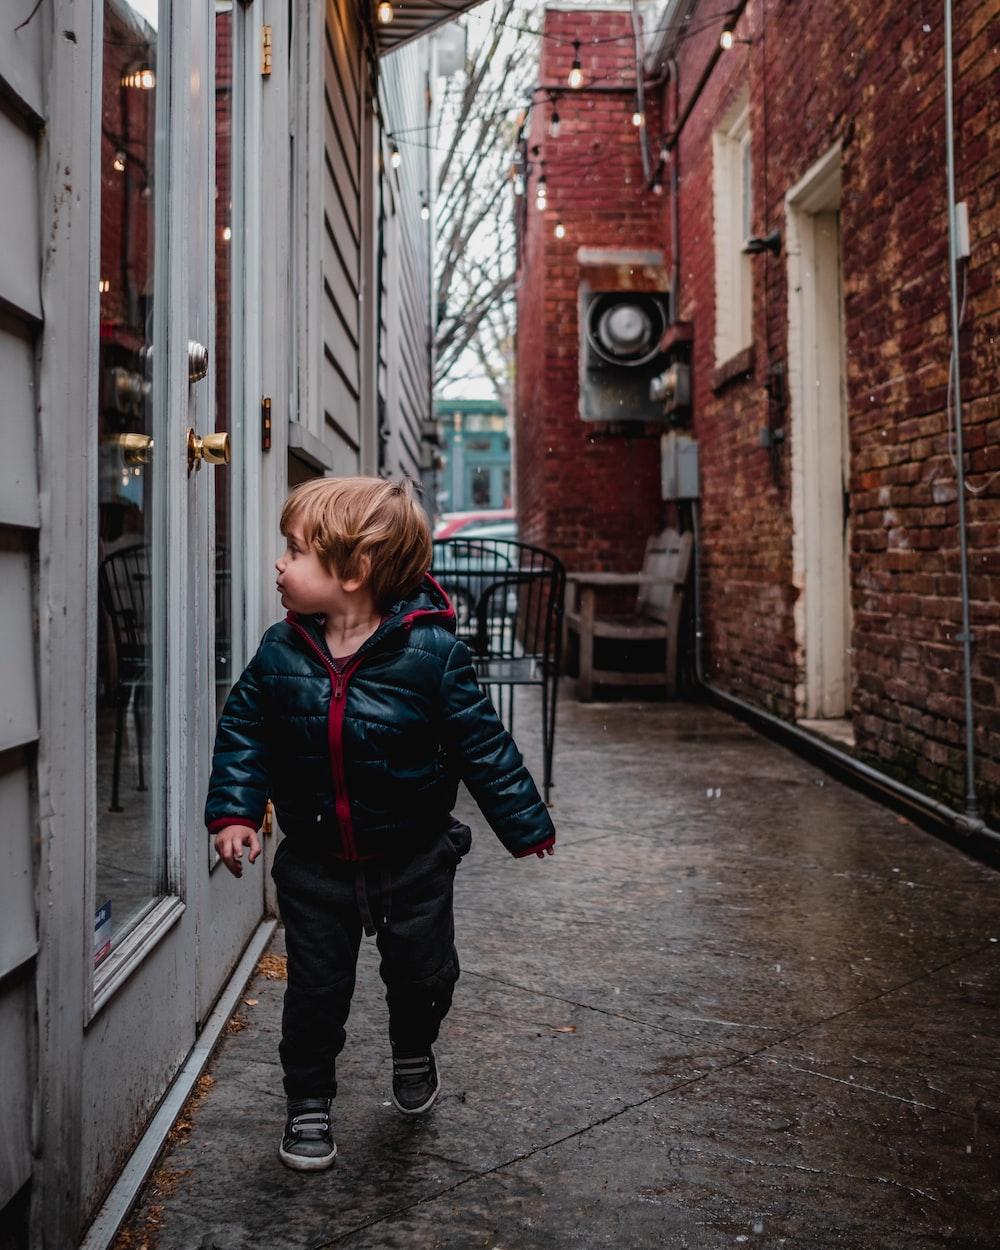 boy in black jacket walking looking at full-glass door